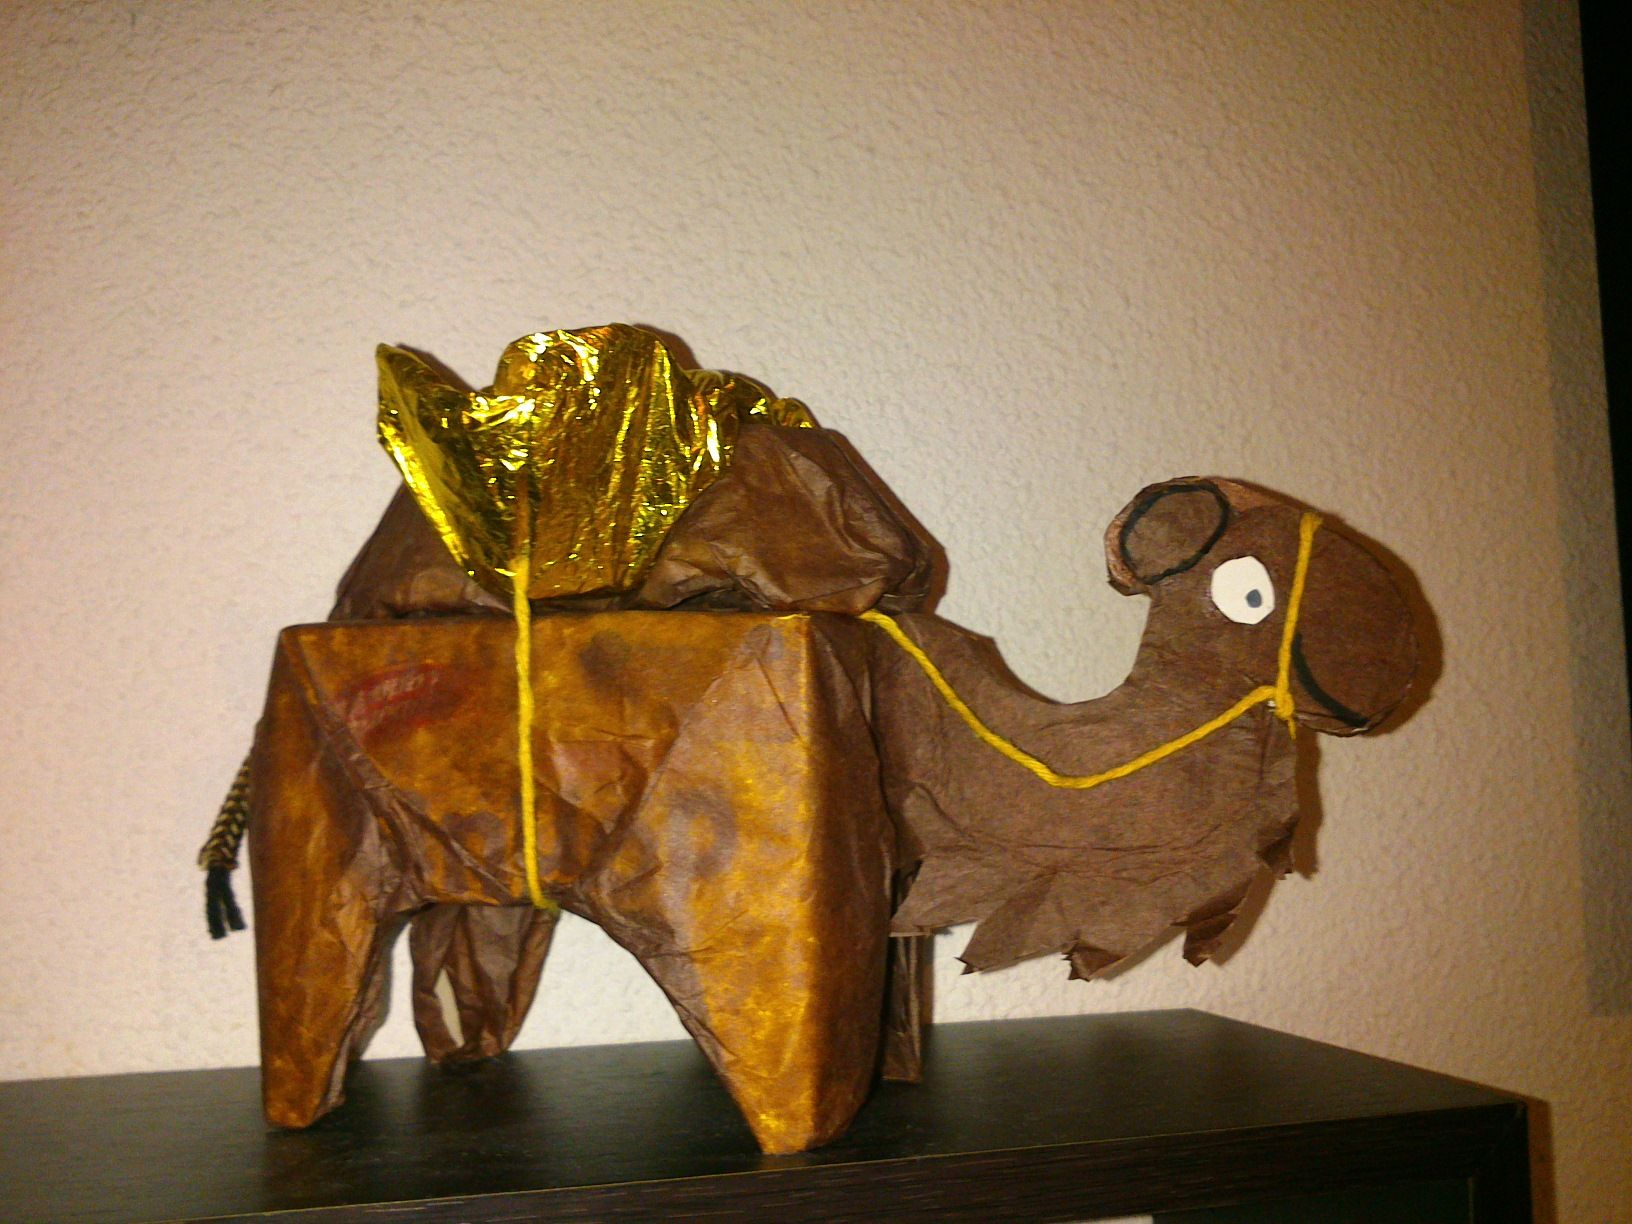 camello de papel reciclado | Material reciclado | Pinterest ...